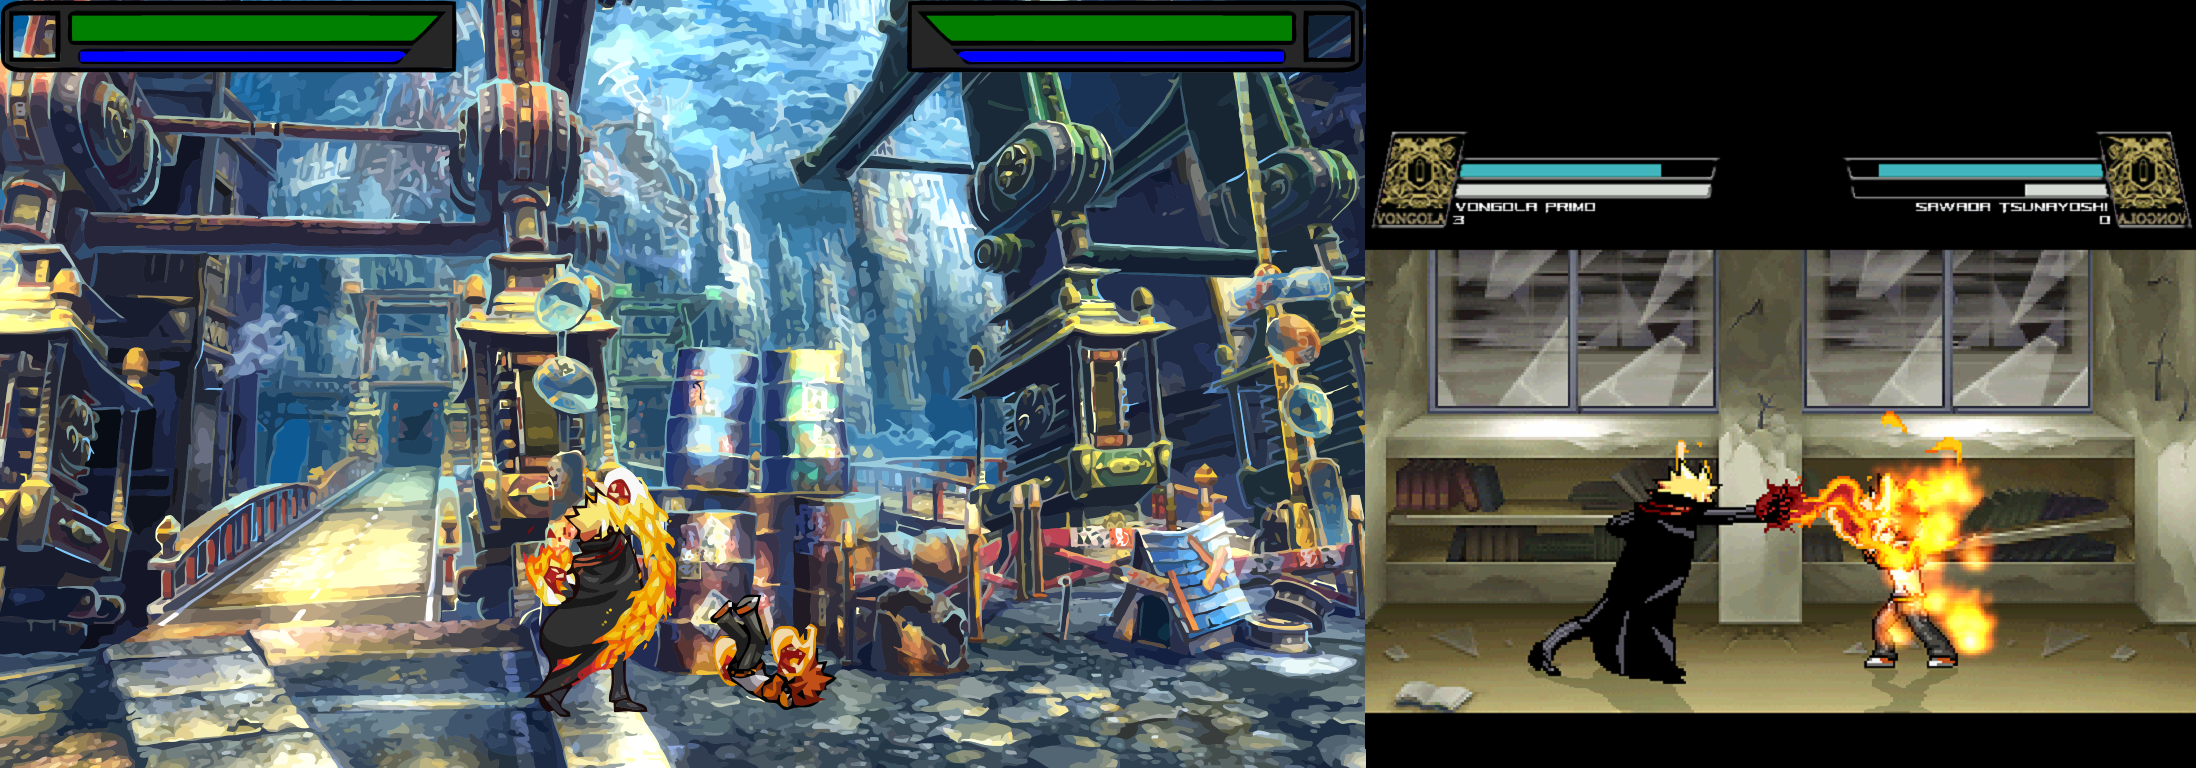 pixel art games pc download